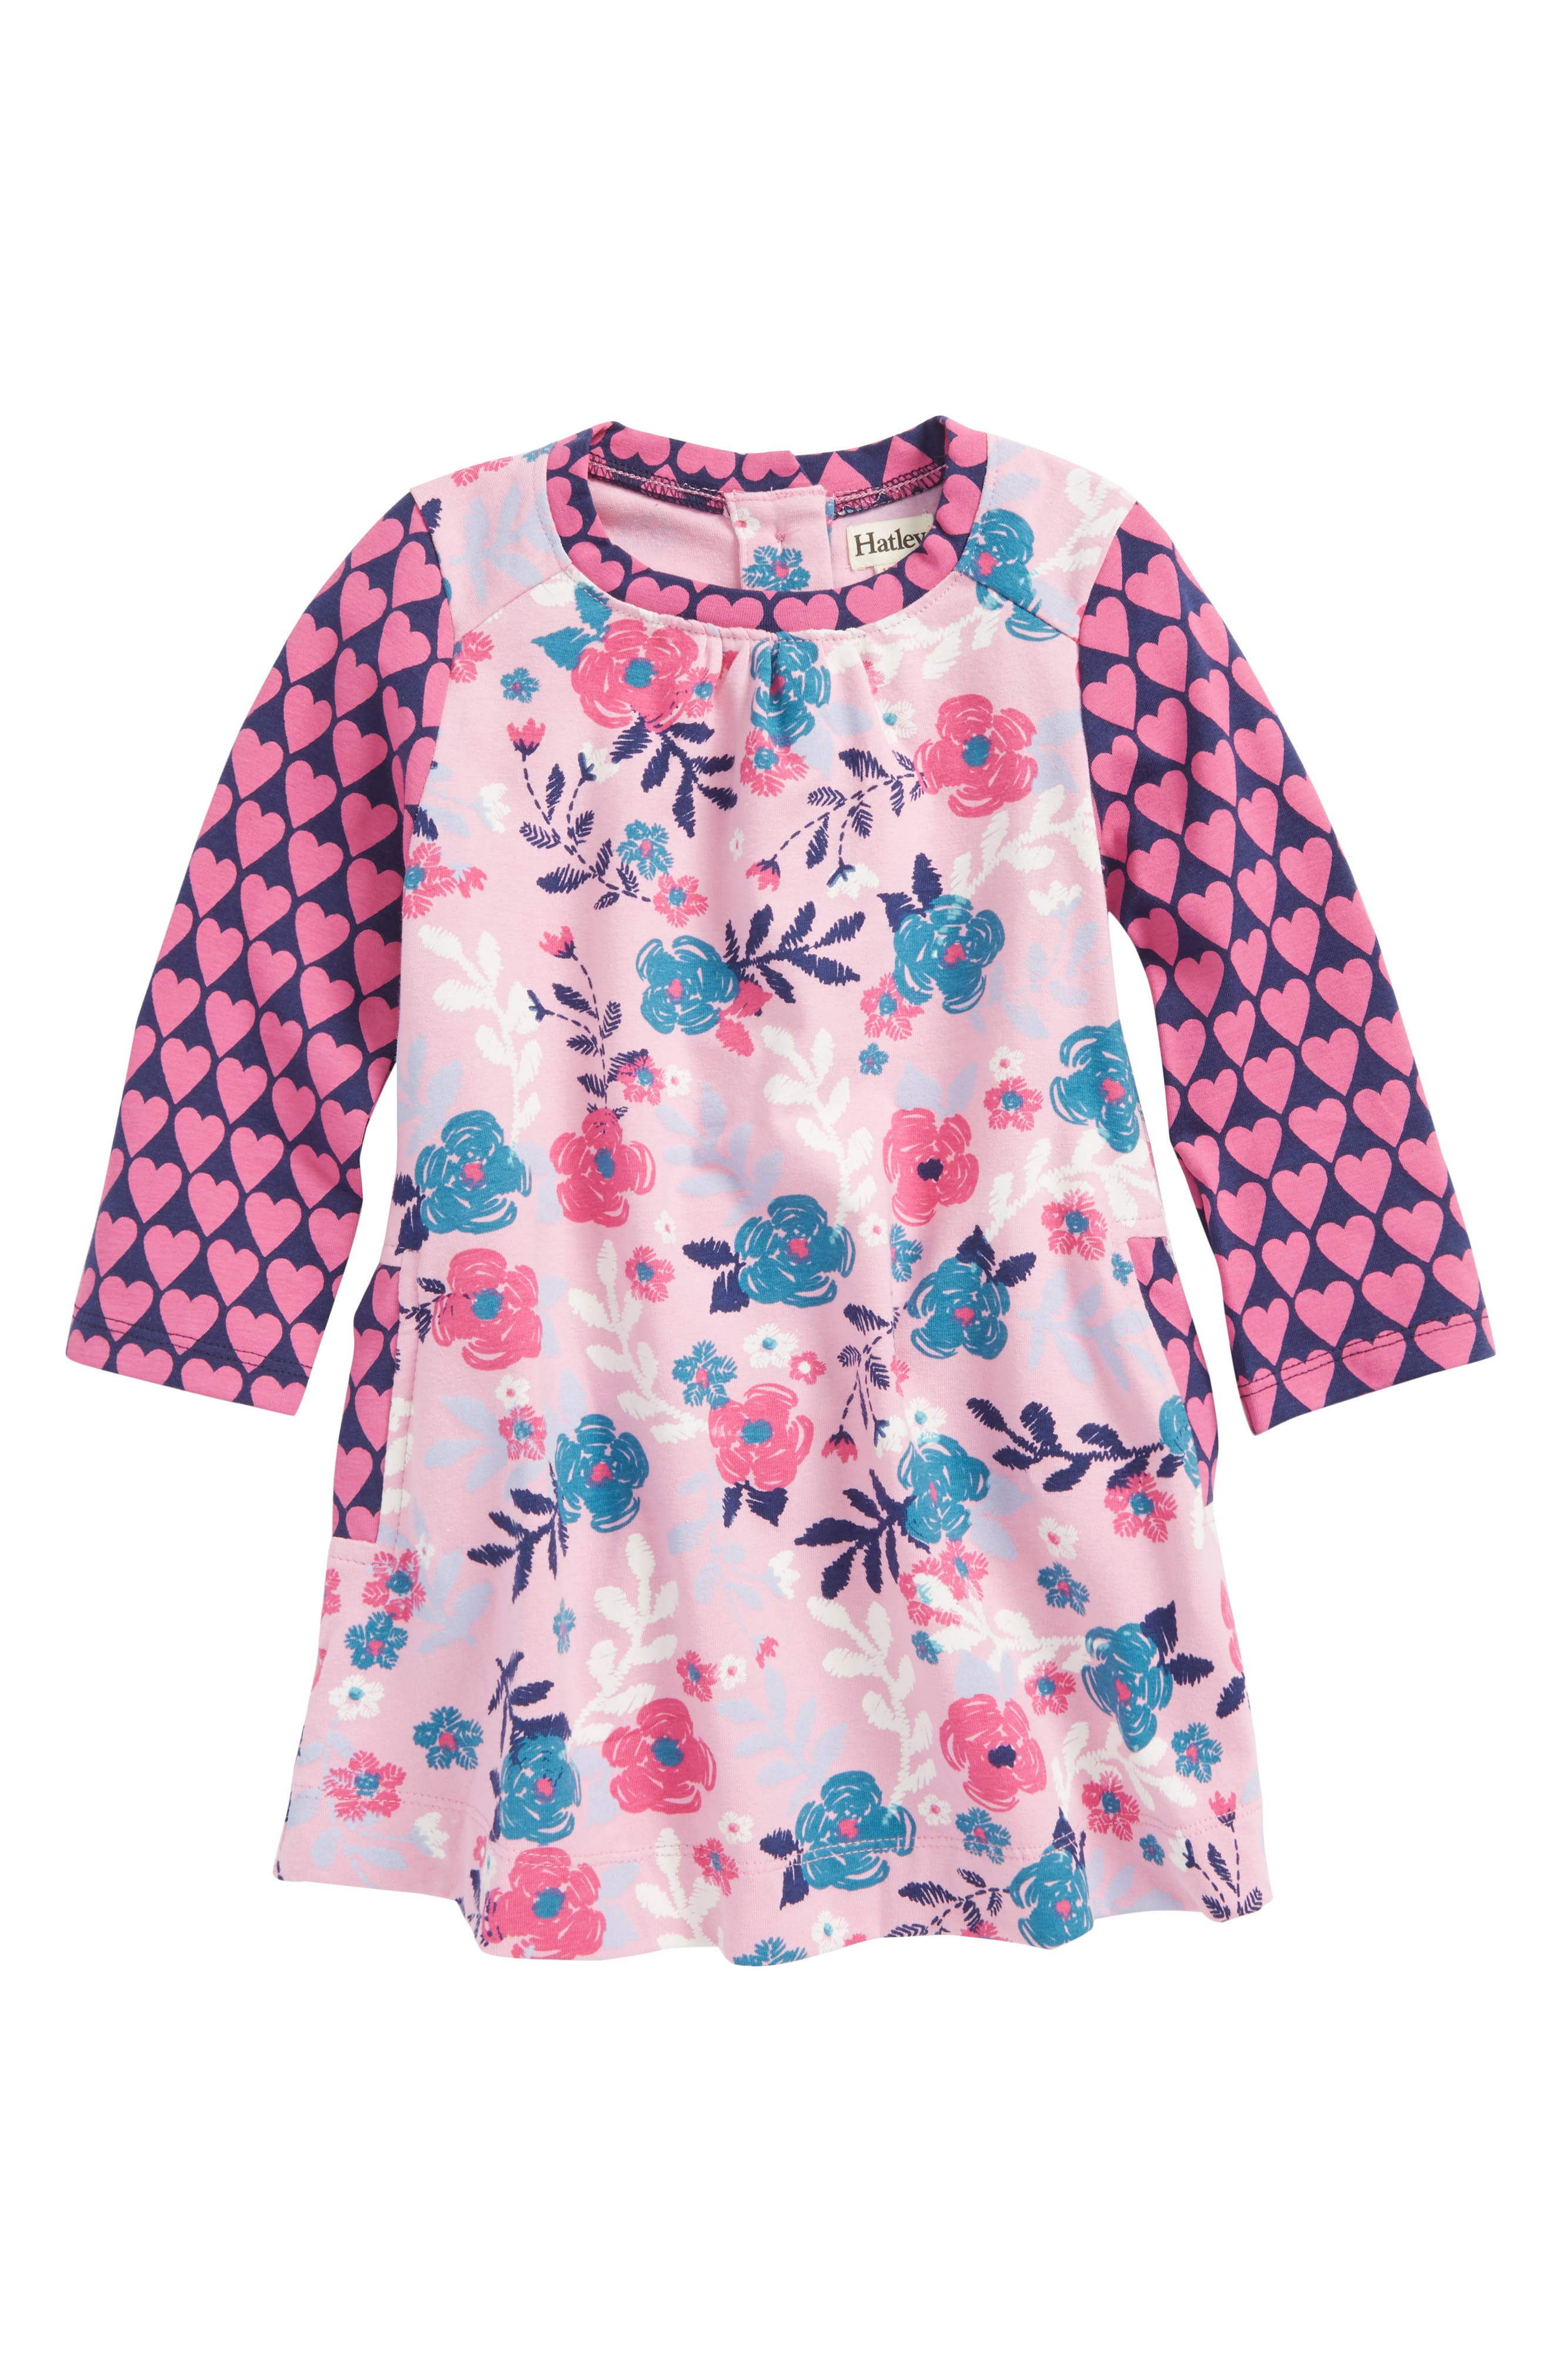 Alternate Image 1 Selected - Hatley Mini Swing Dress (Baby Girls)